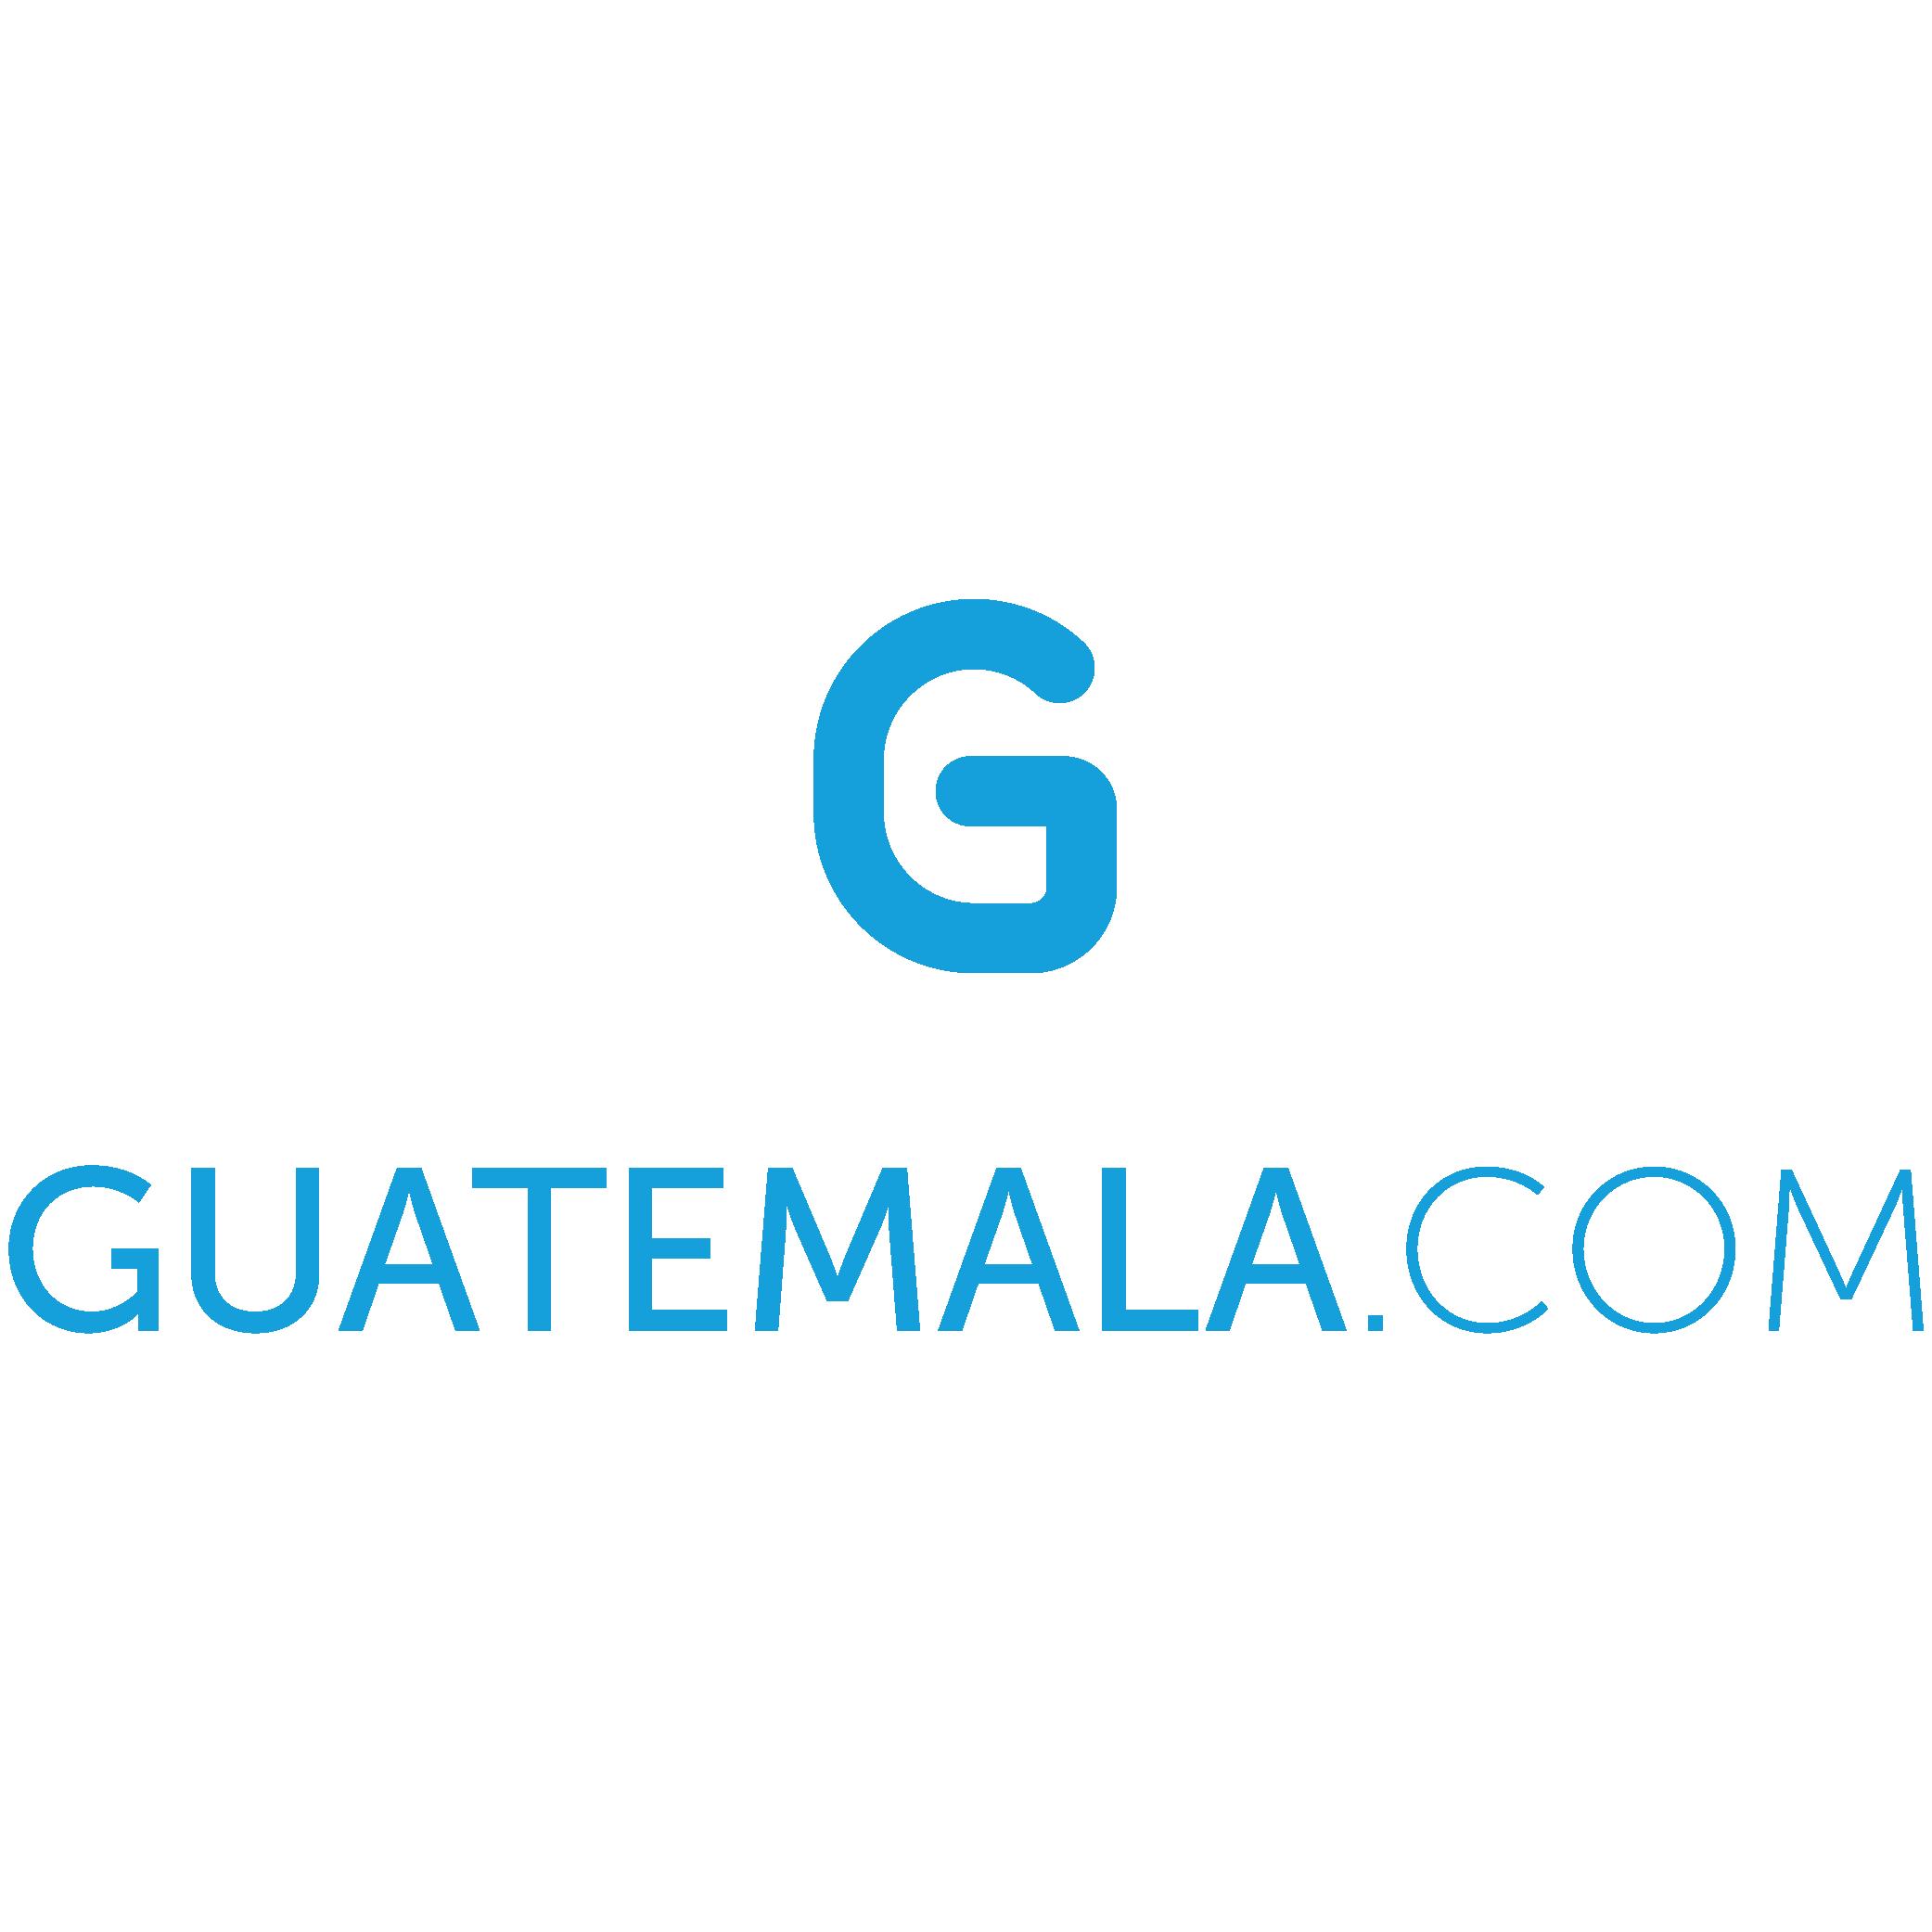 Guatemala.com logo